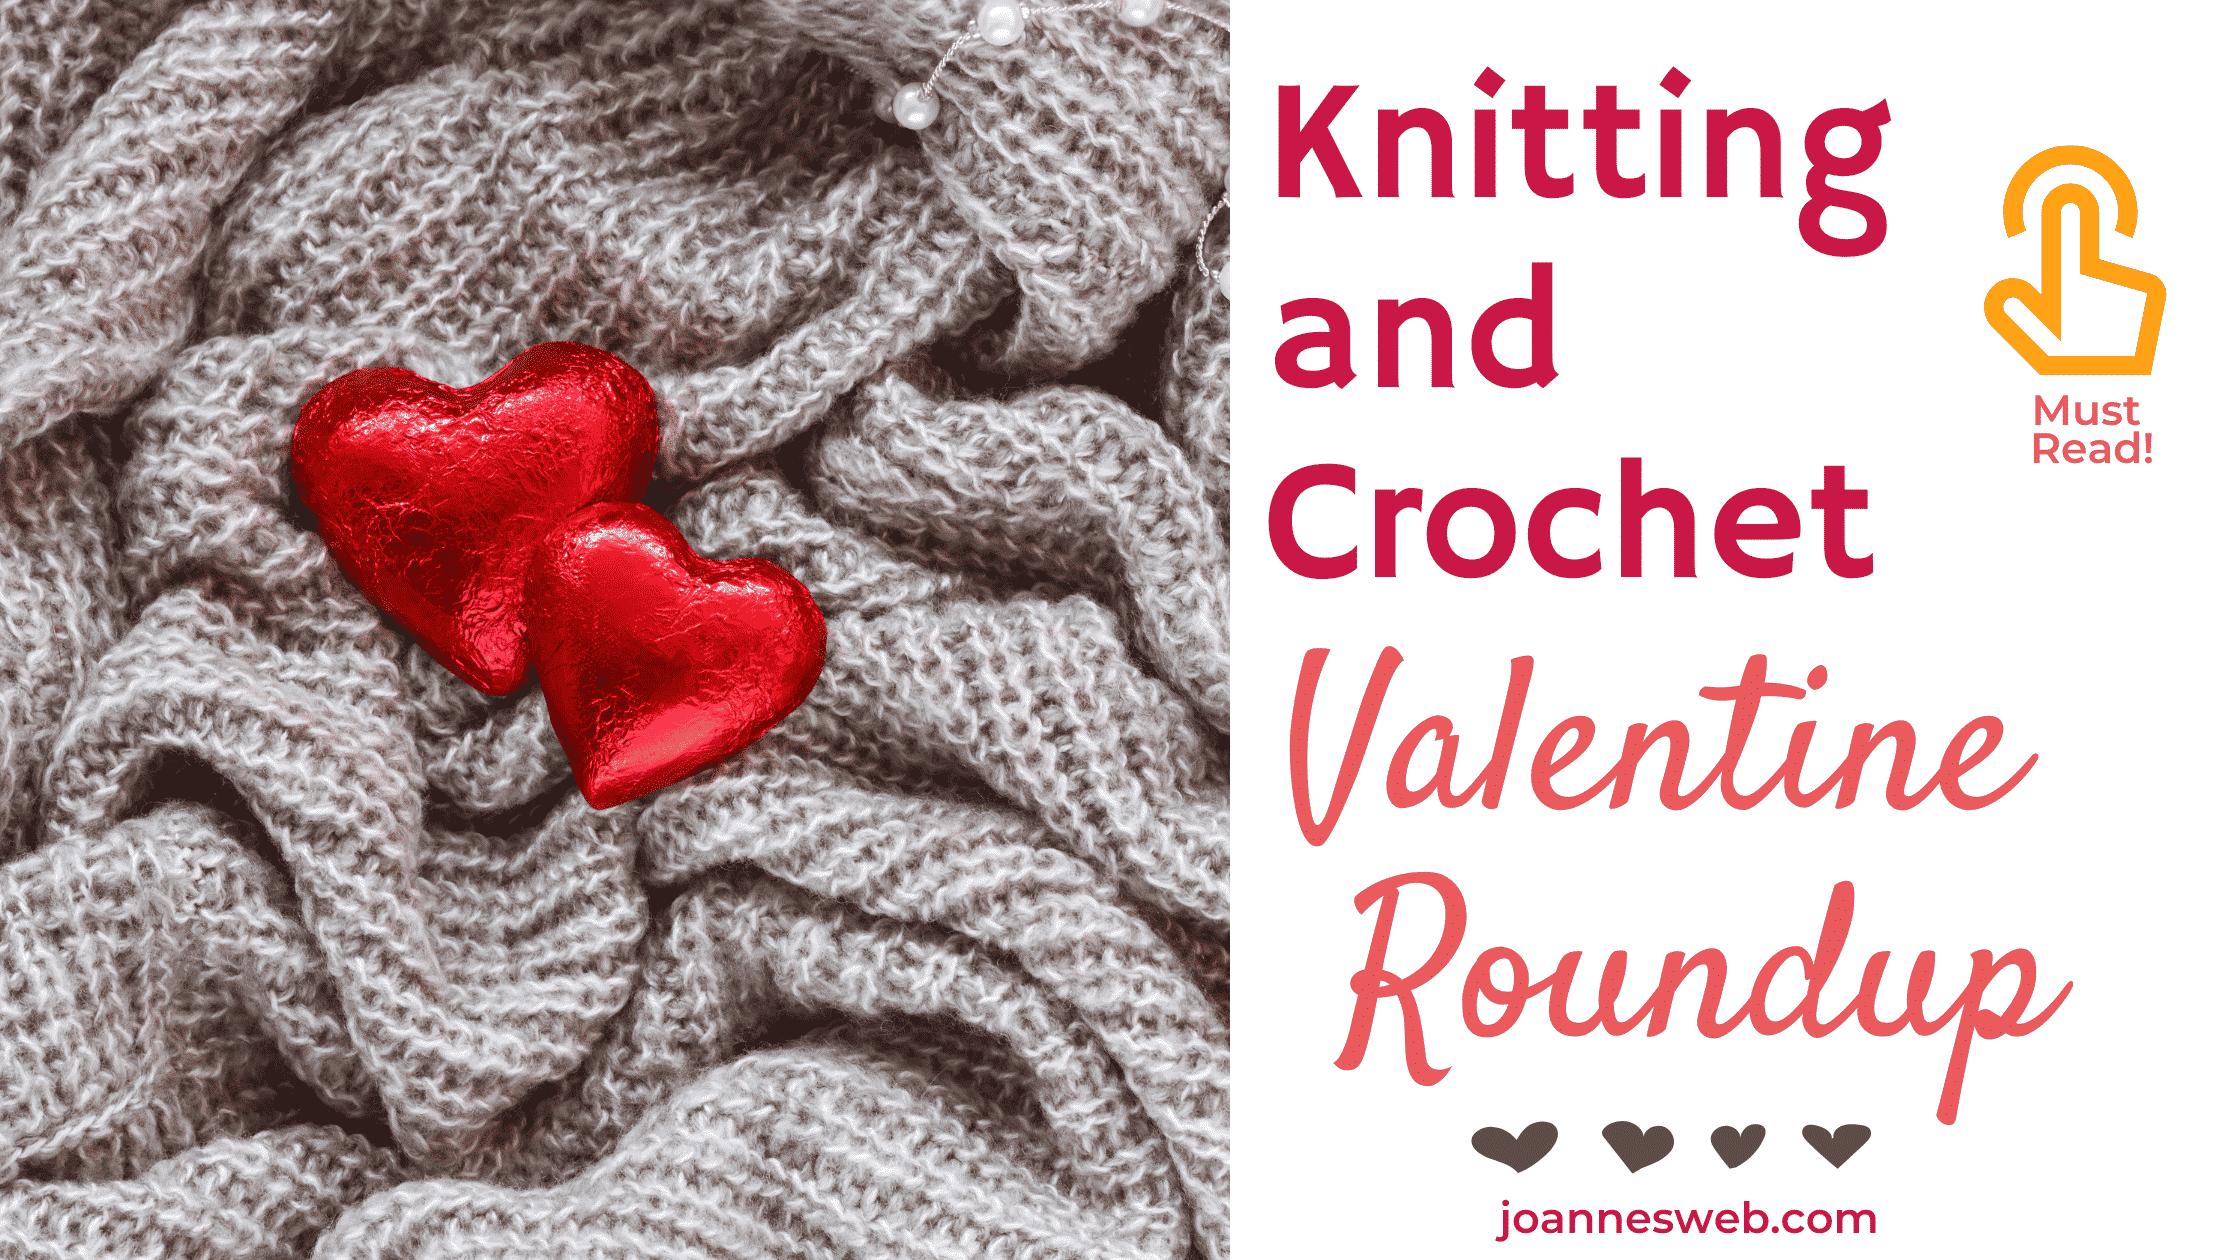 Knitting and Crochet Valentine Roundup